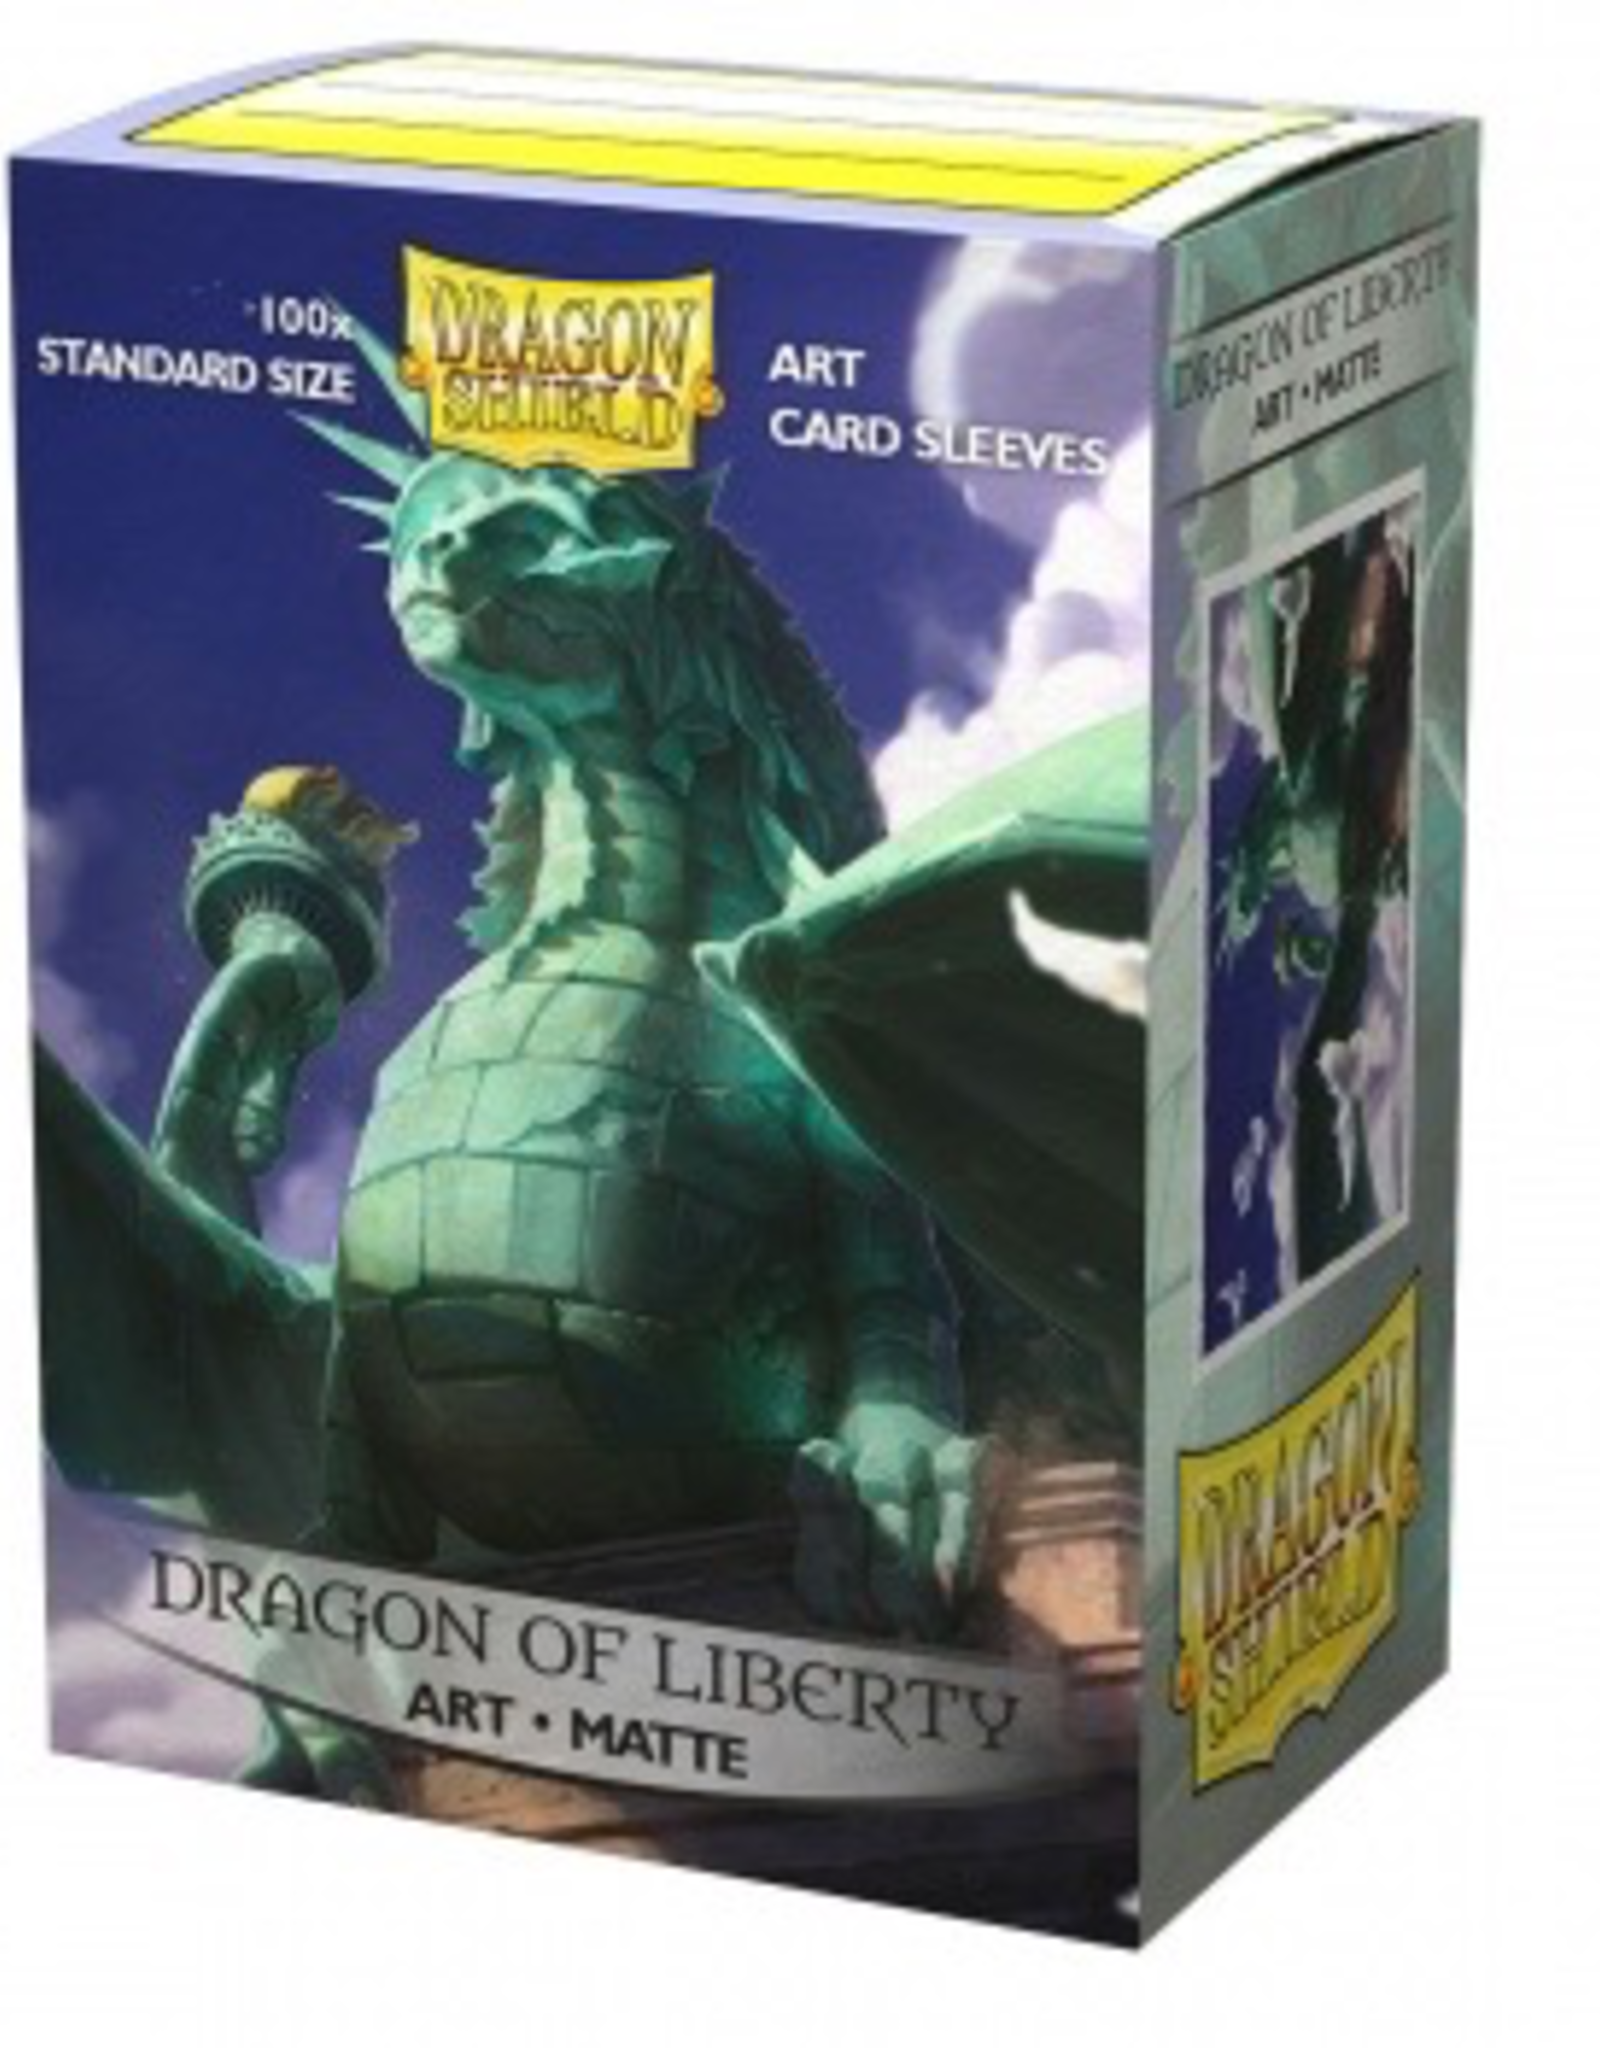 DS - Standard Sleeves Dragon Shield Matte Art Sleeves - Dragon of Liberty (100 Sleeves)